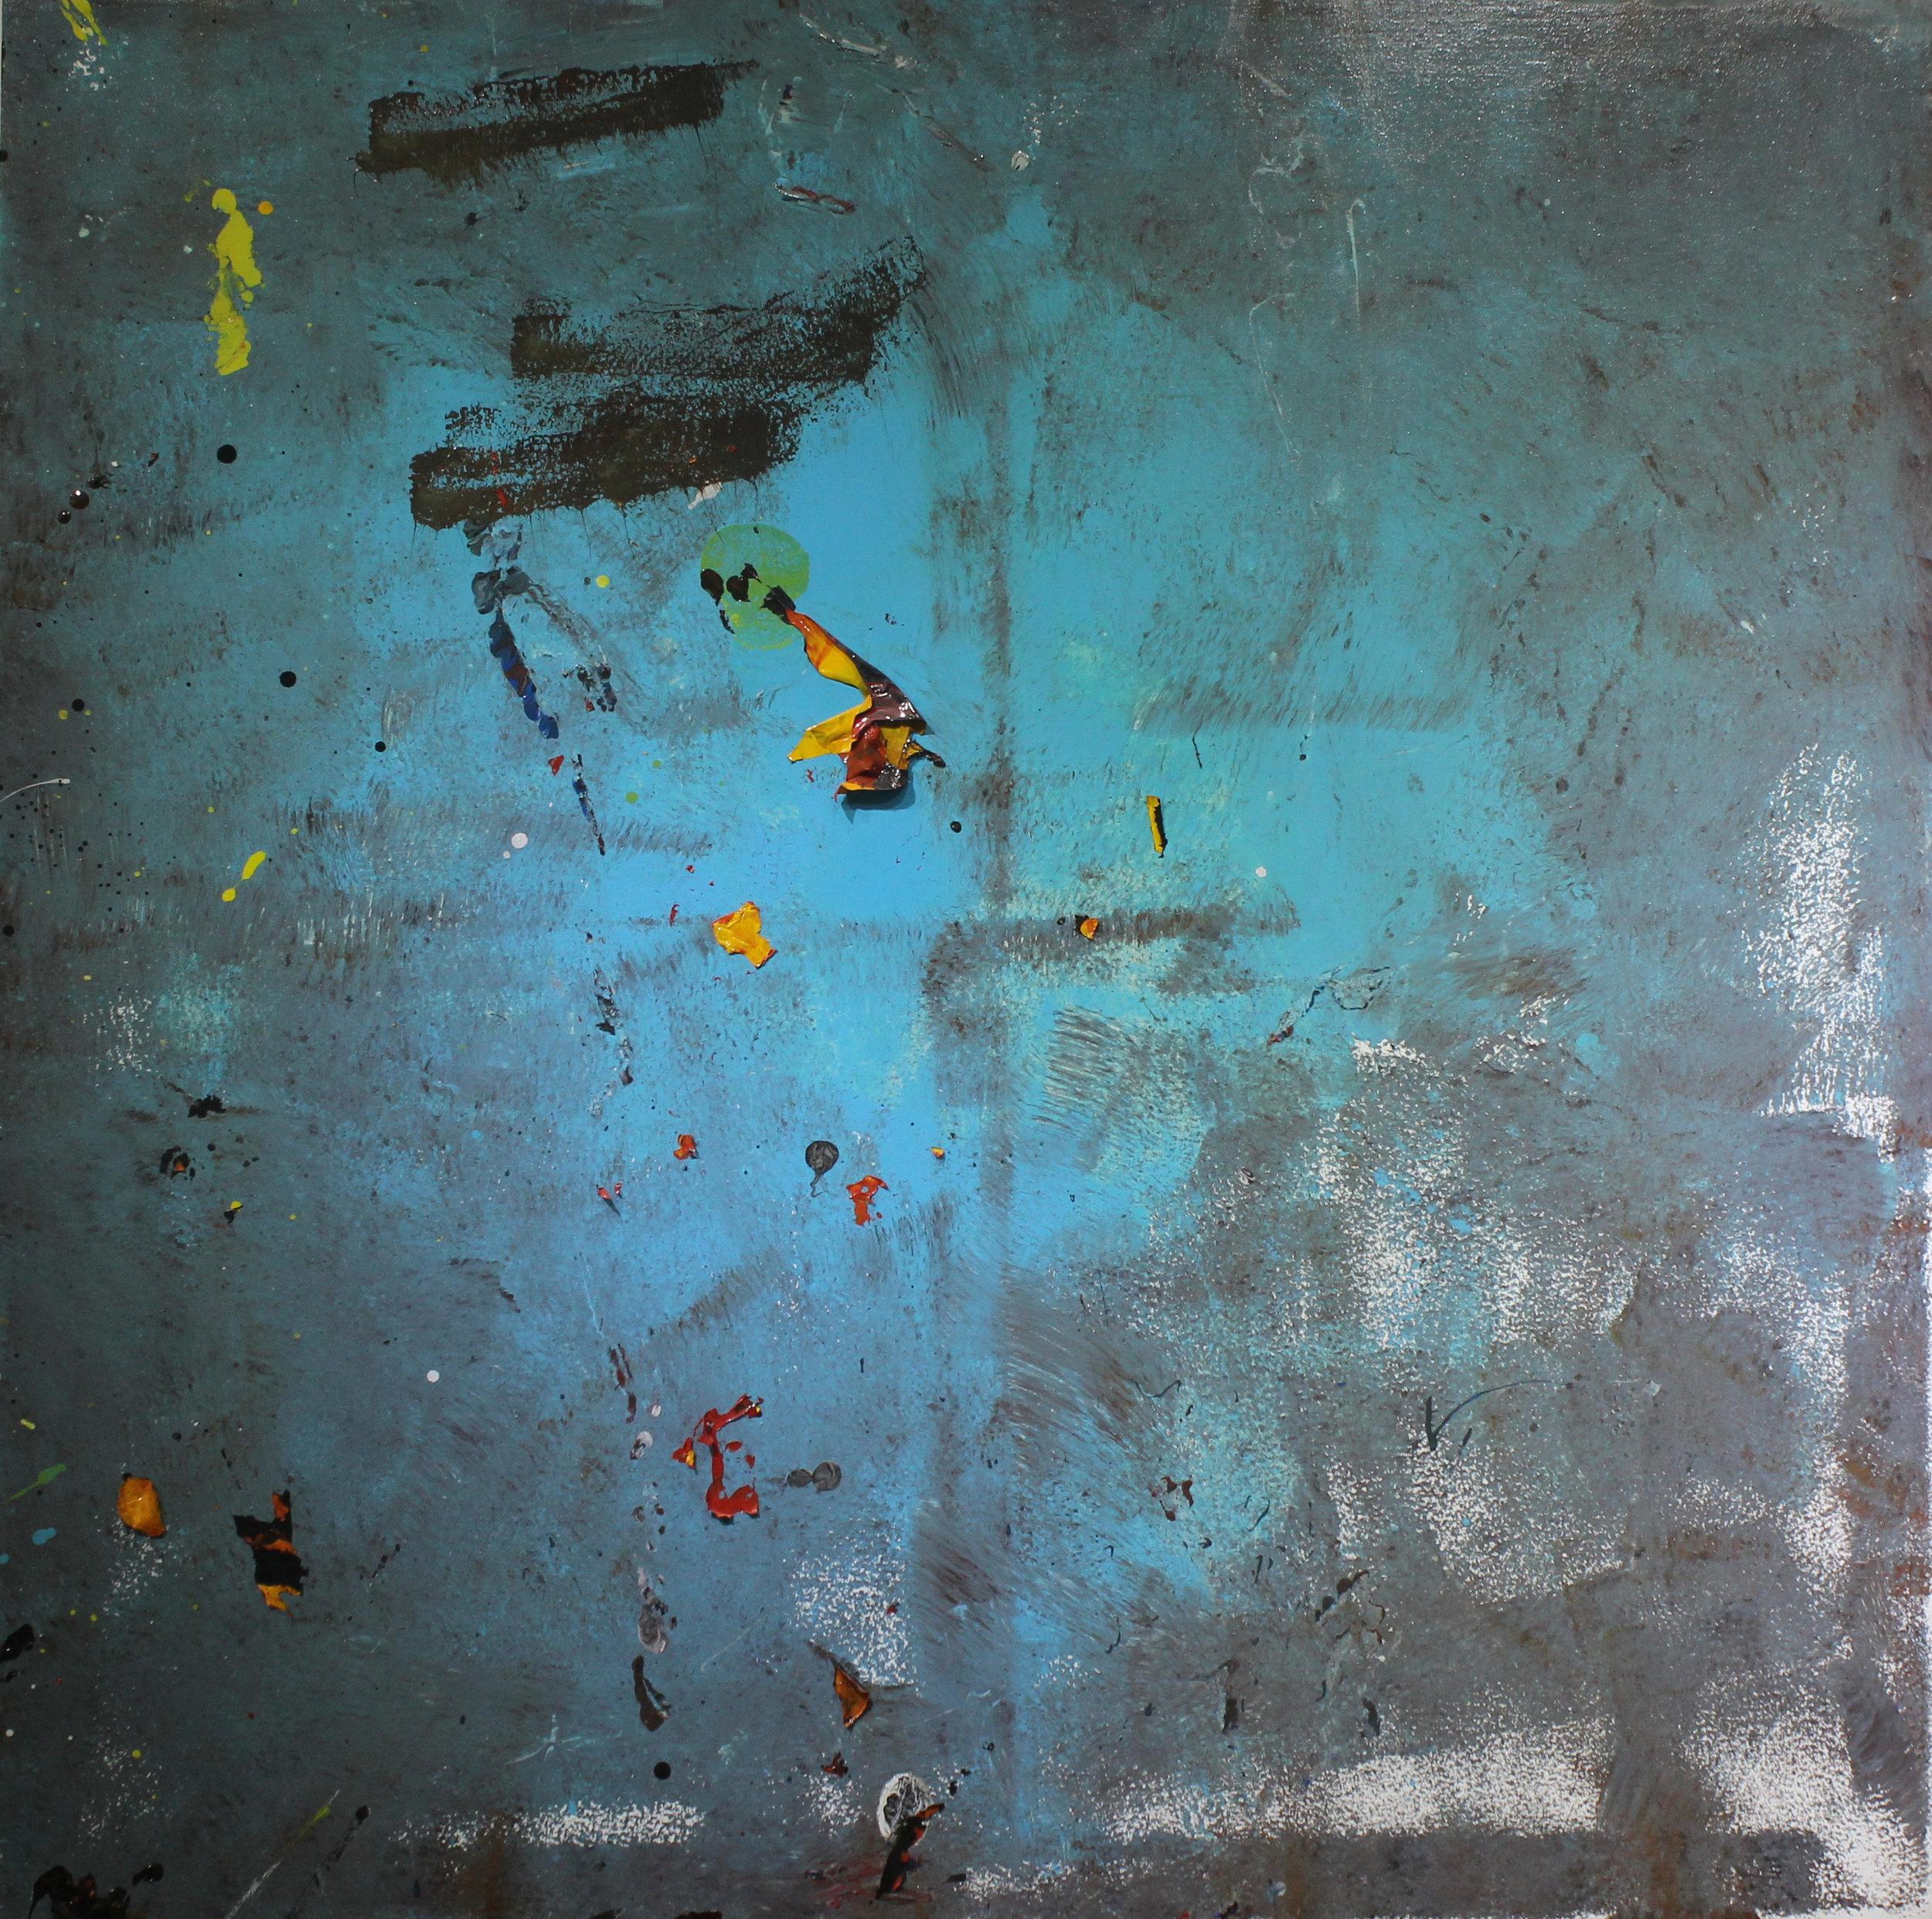 Untitled, 2013, enamel paint on canvas, 122 x 122 cm